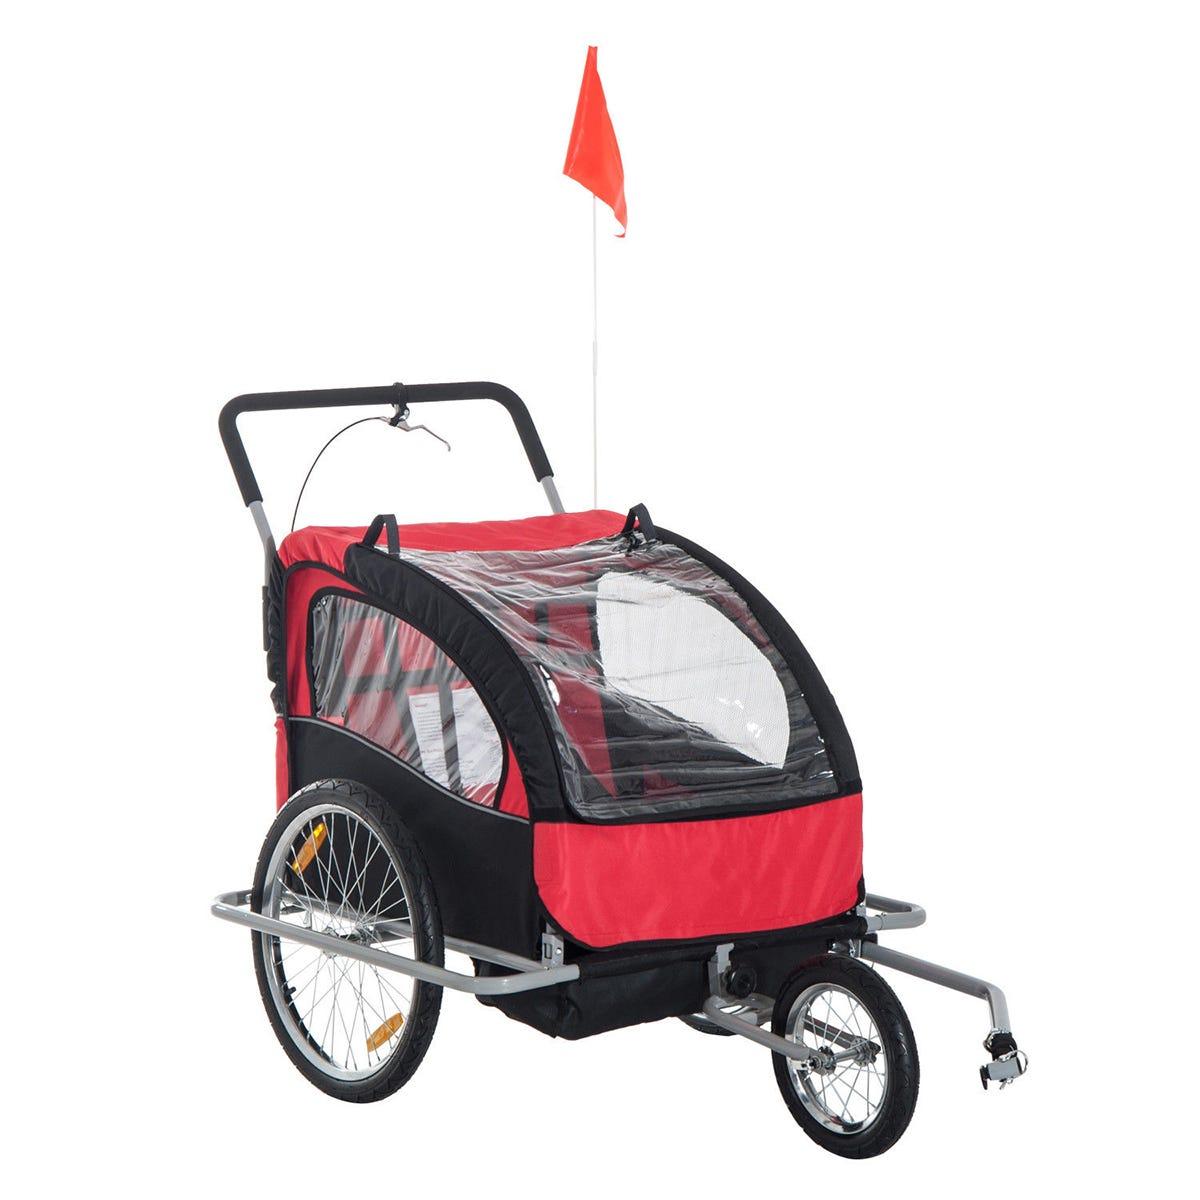 Reiten 2-in-1 Collapsible 2-Seater Kids Stroller & Bike Trailer with Pivot Wheel - Black/Red